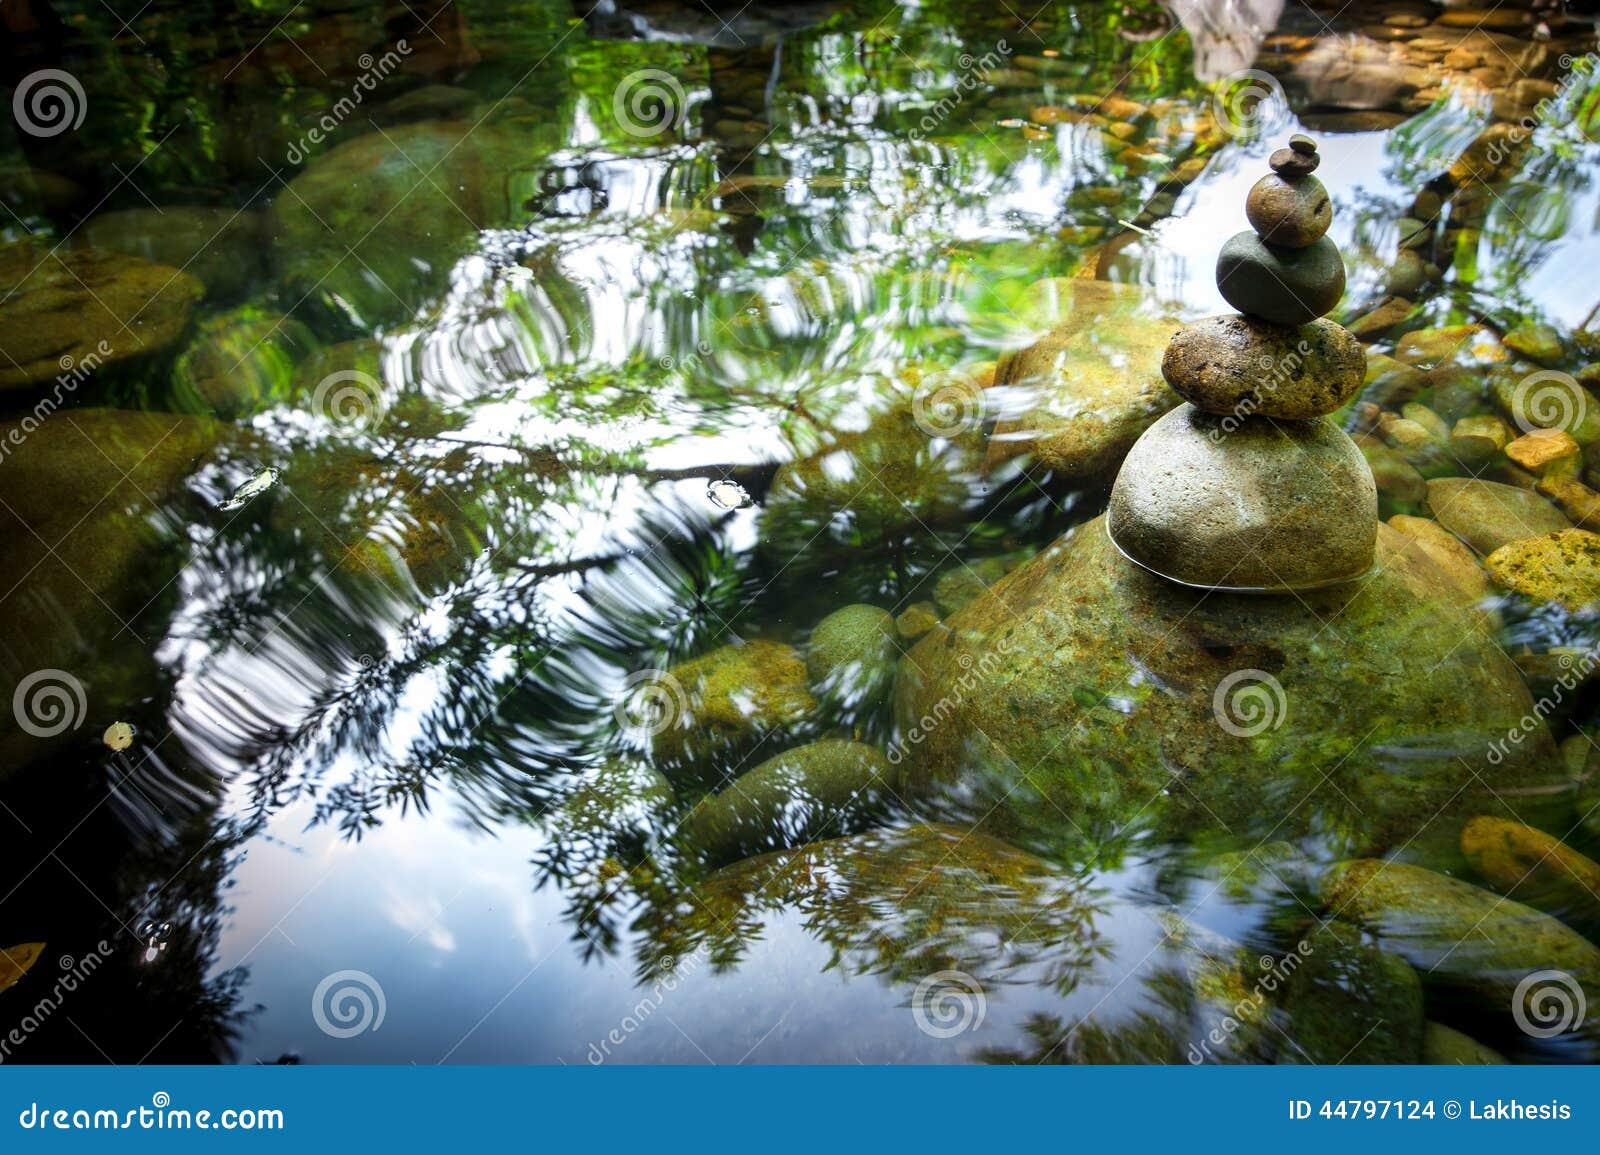 Balancing rocks tower for zen meditation practice nature background stock photo image 44797124 - Image zen nature ...